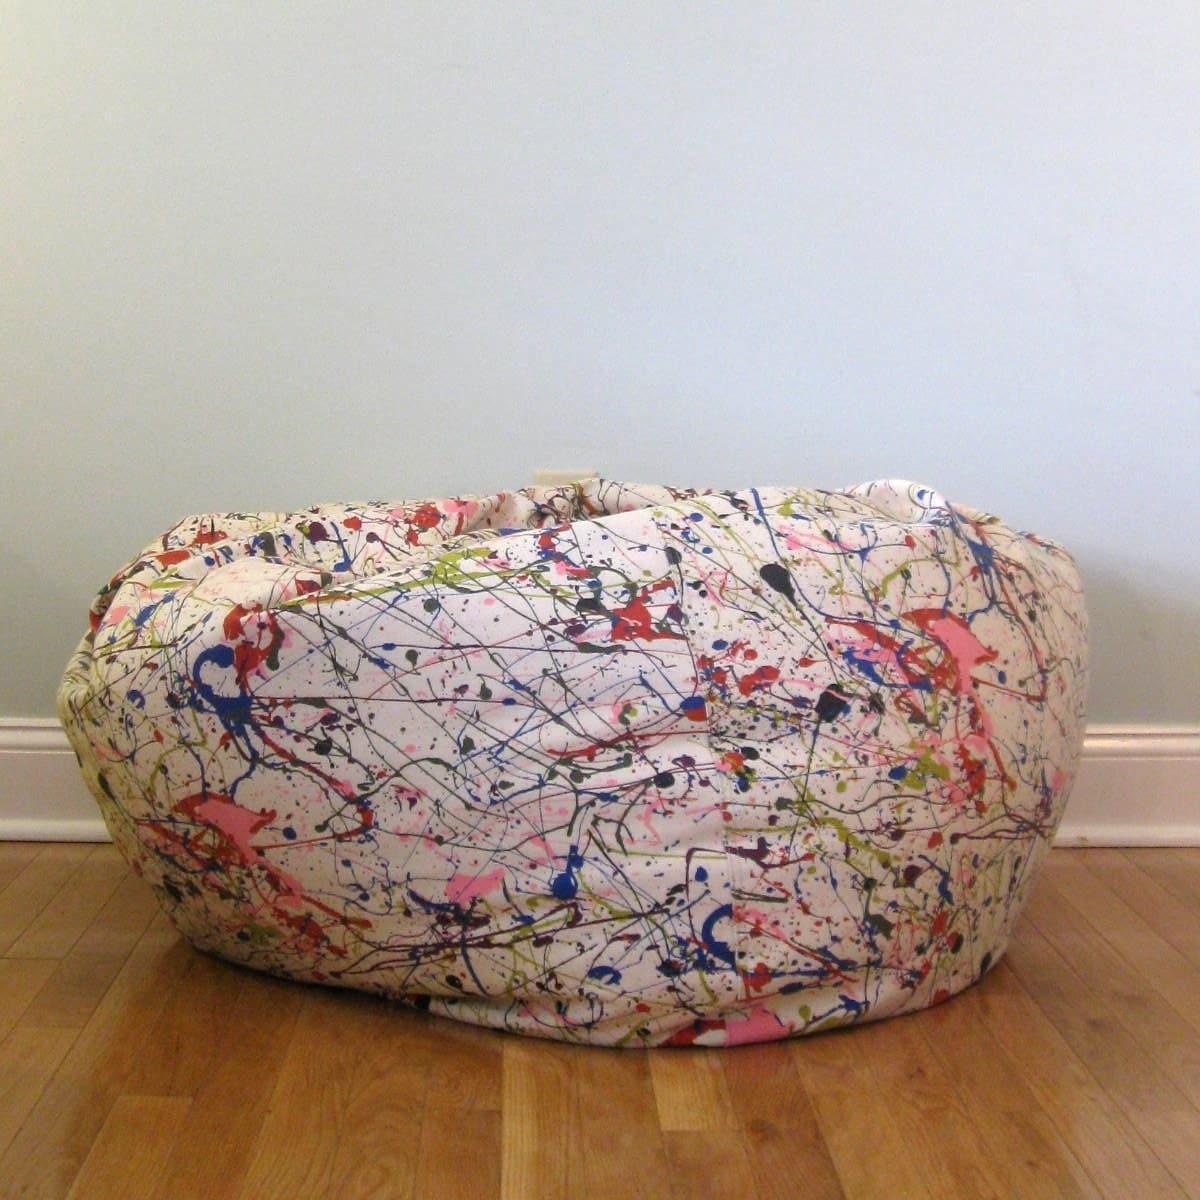 Free Shipping Circa 1980s Paint Splatter Print Bean Bag Chair